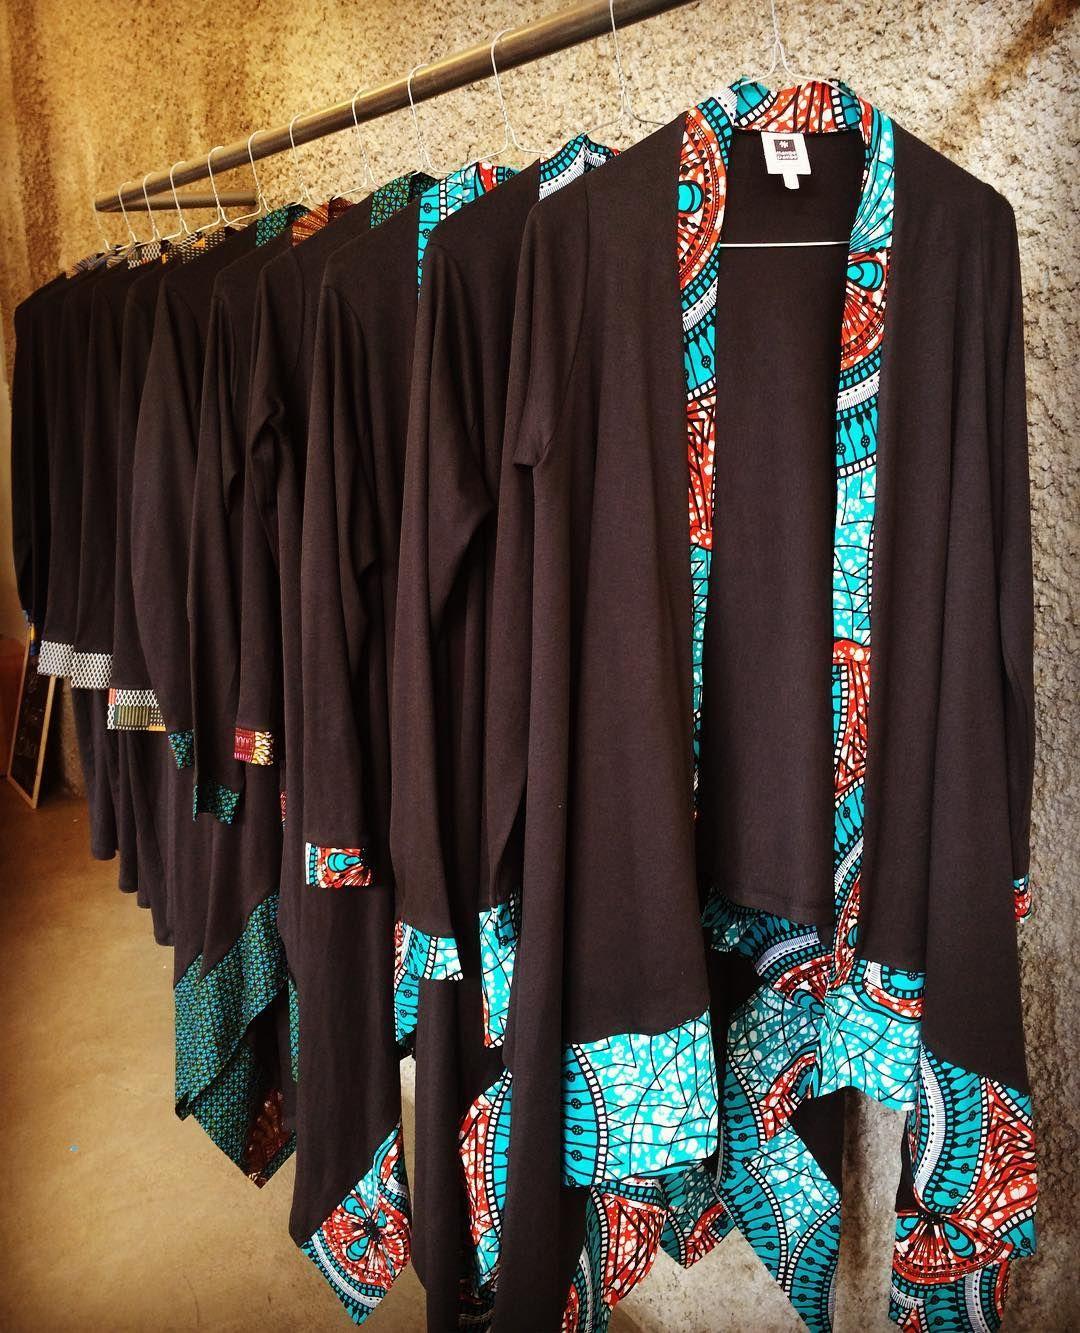 Republi Ke Kenya On Instagram New Stock Alert Mambo Pambo Waterfalls And Dusters With K Latest African Fashion Dresses African Fashion African Wear Dresses